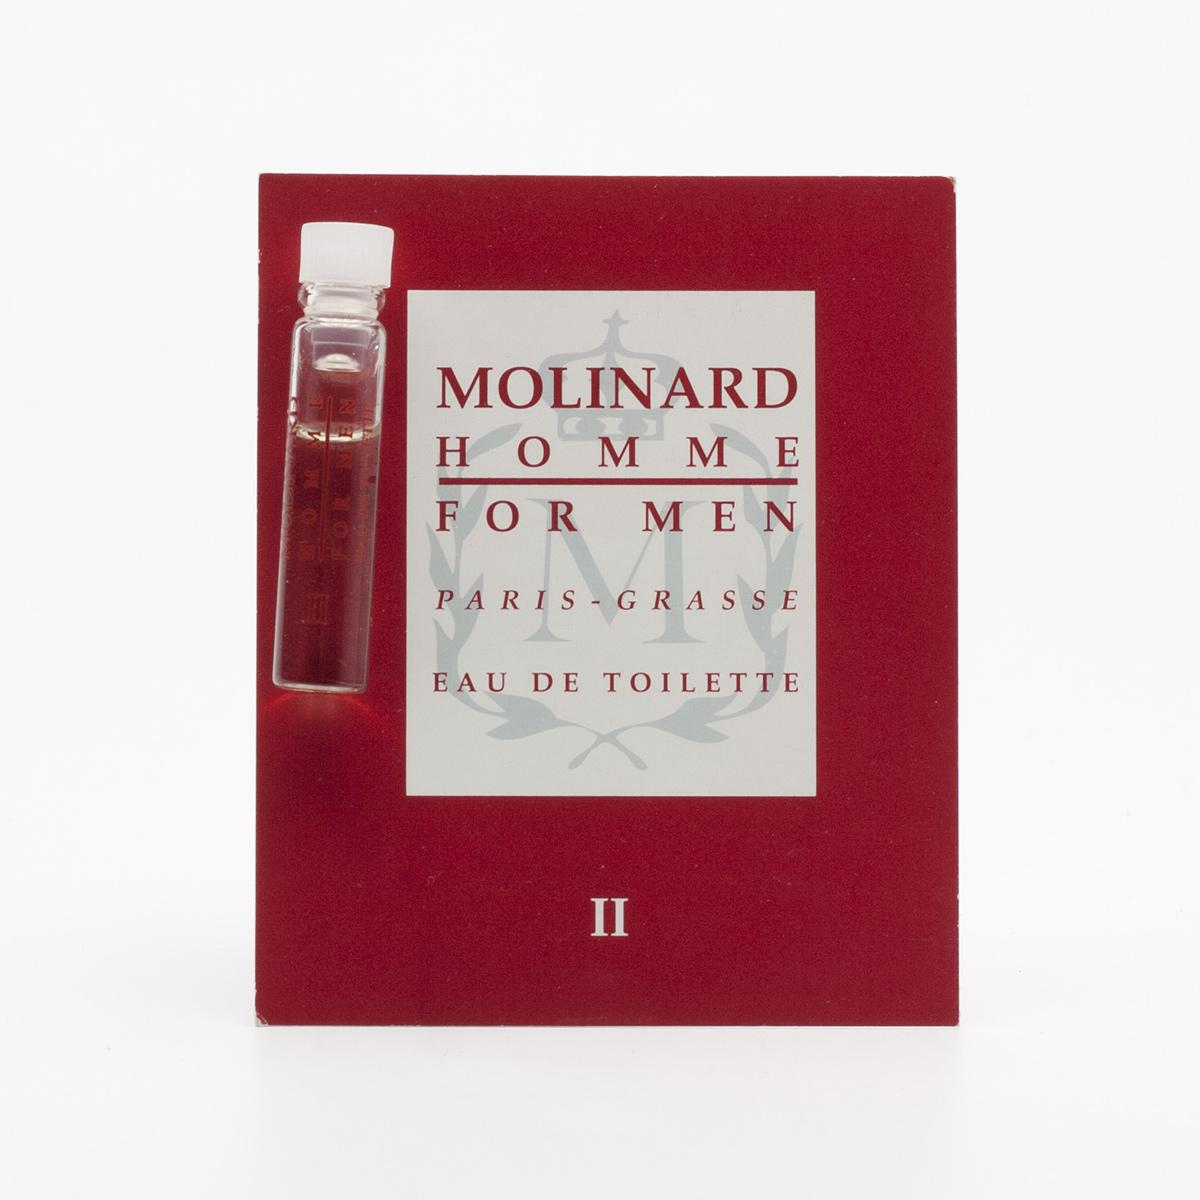 Molinard Toaletní voda Homme II 1 ml